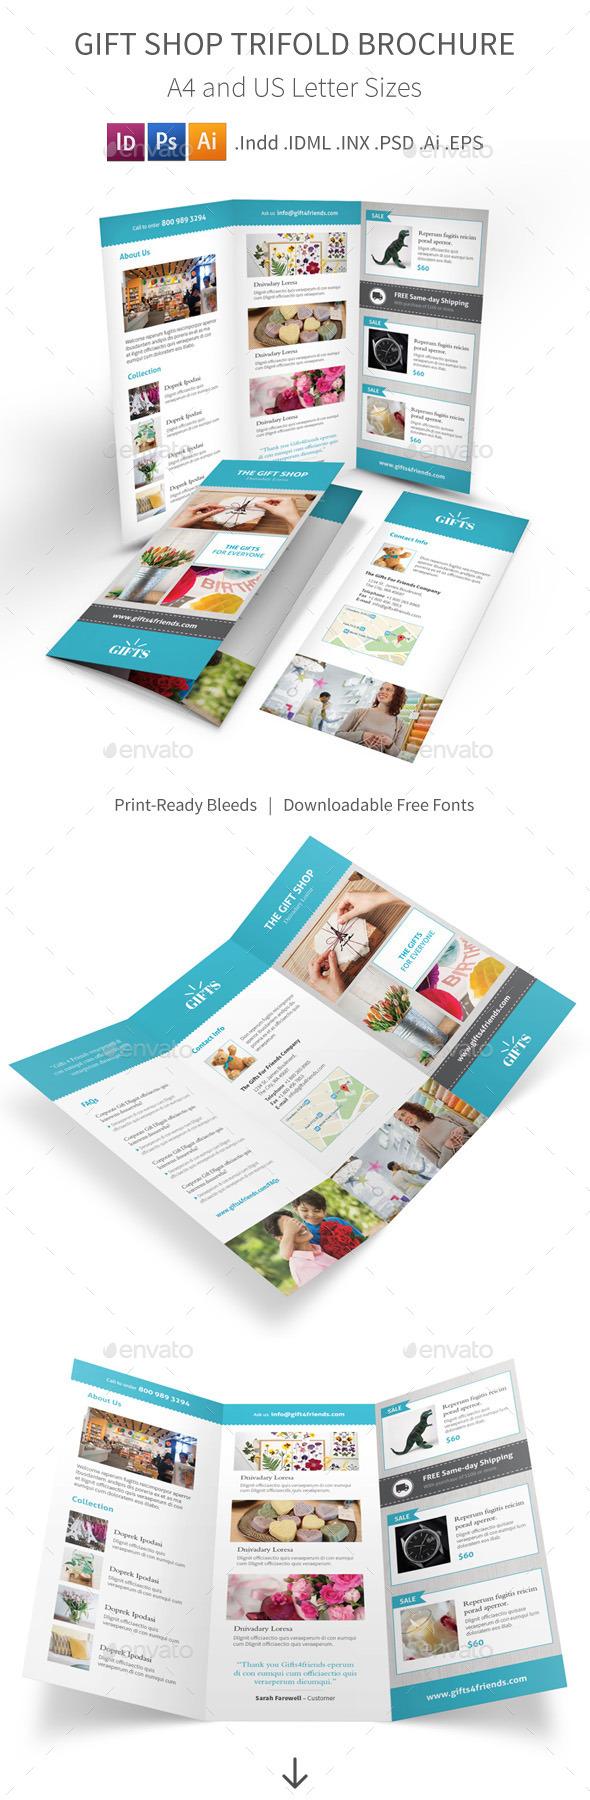 Gift Shop Trifold Brochure - Informational Brochures